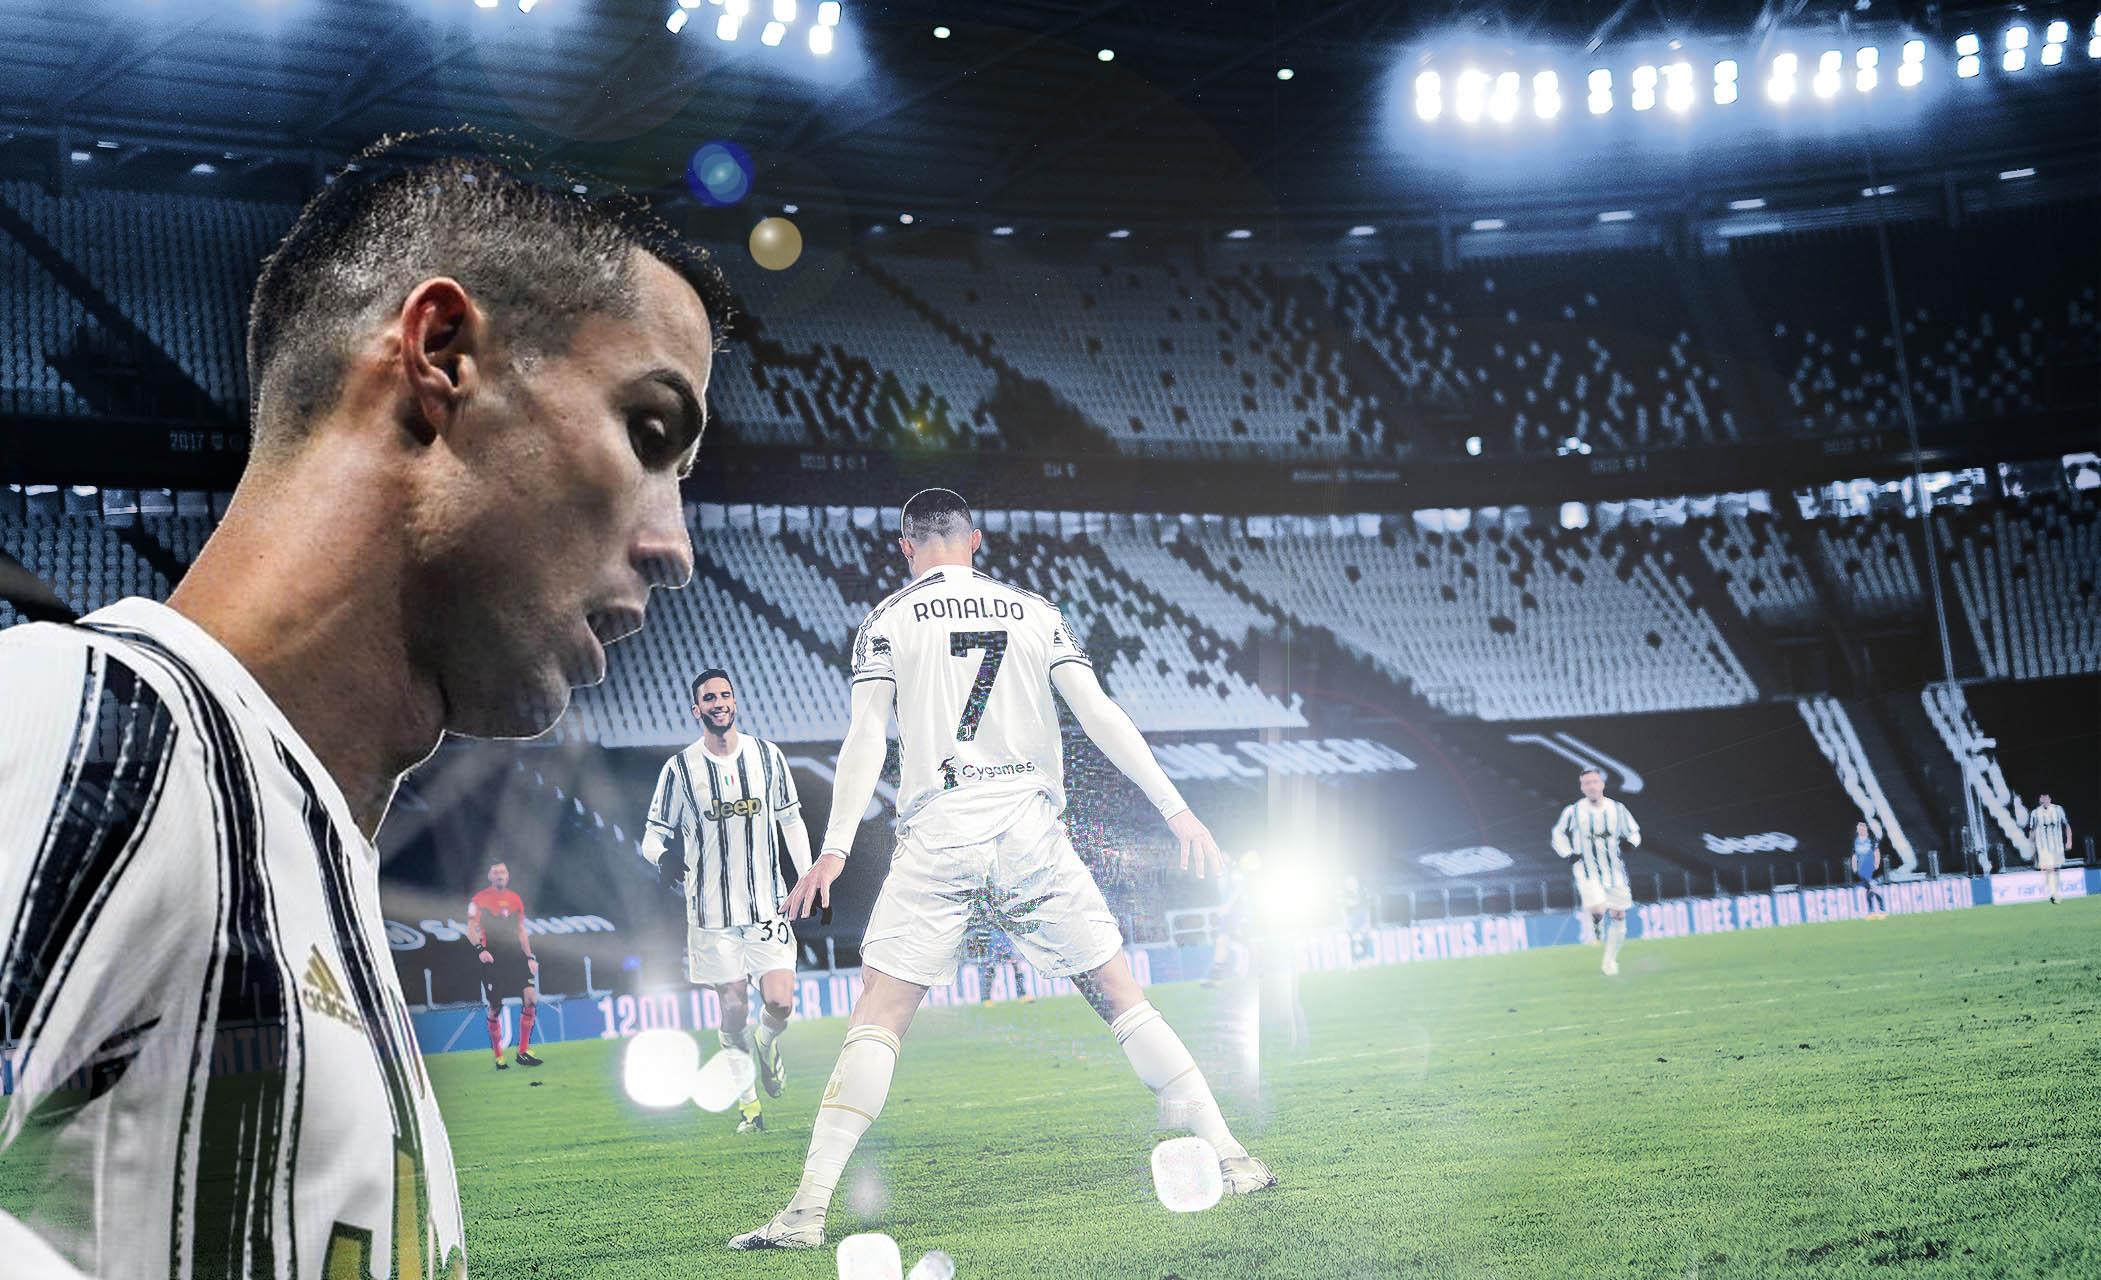 Juventus a San Siro. Ronaldo carica la Juve!